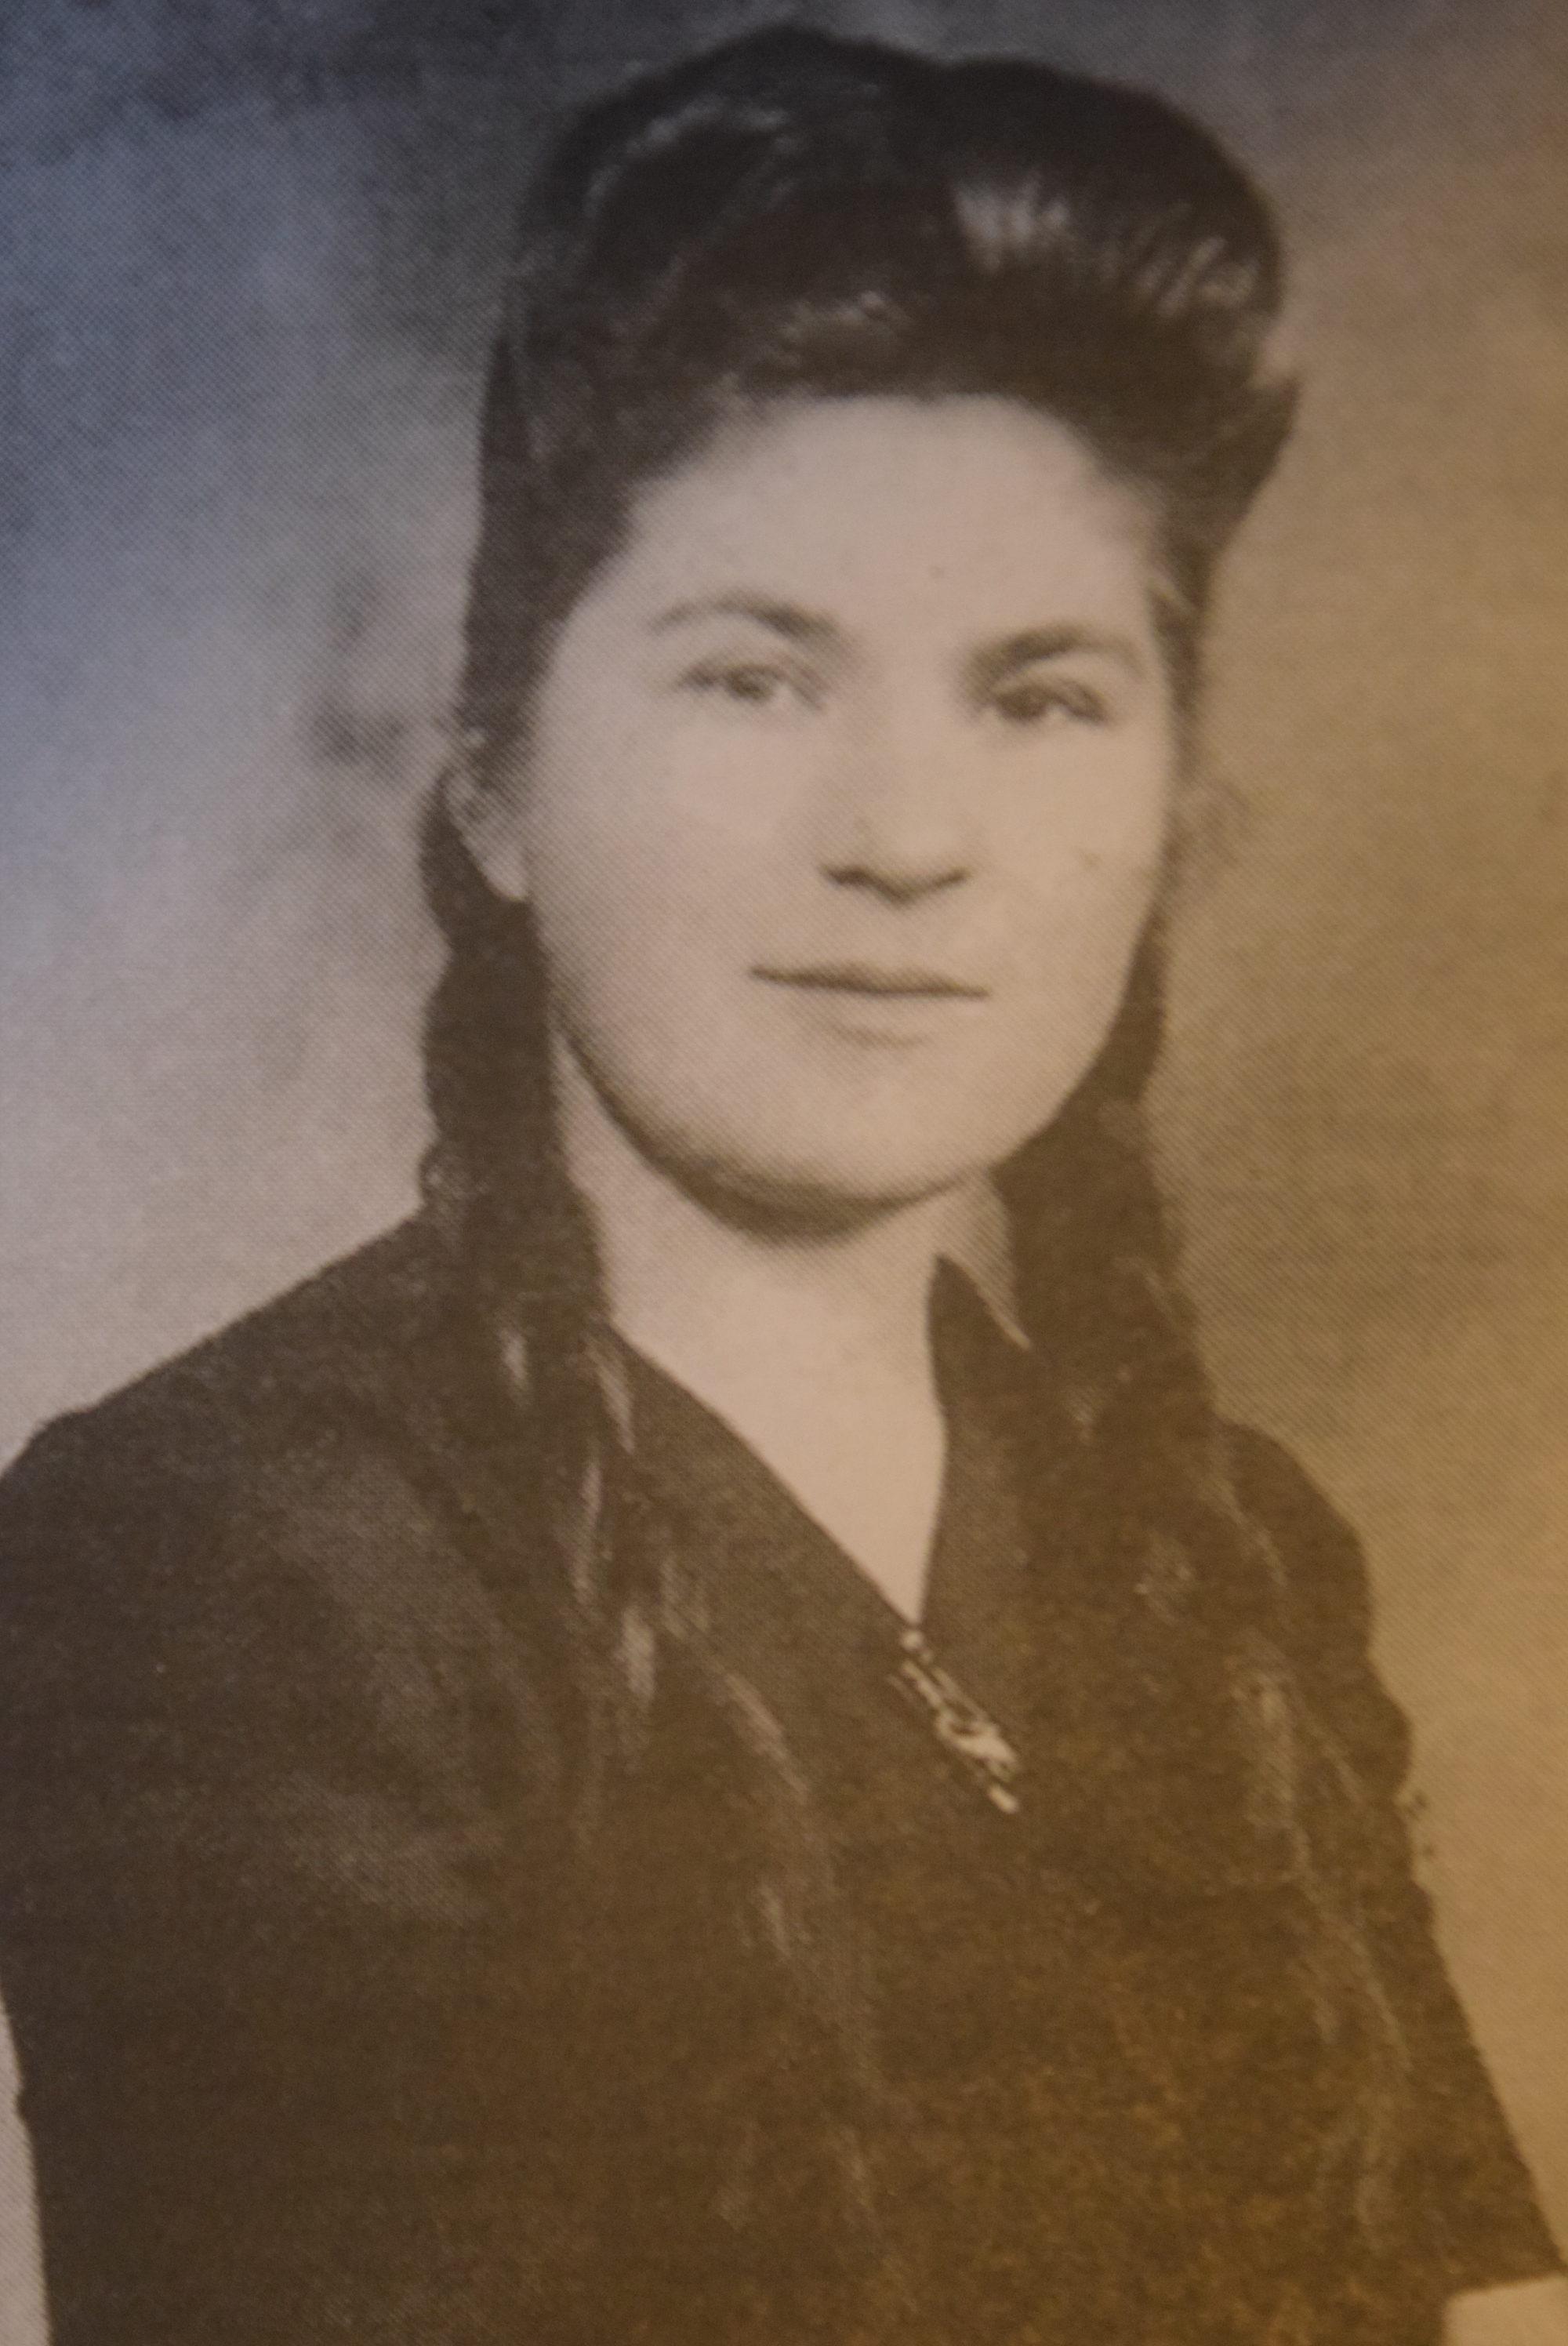 mladenka-kristina-leta-1948